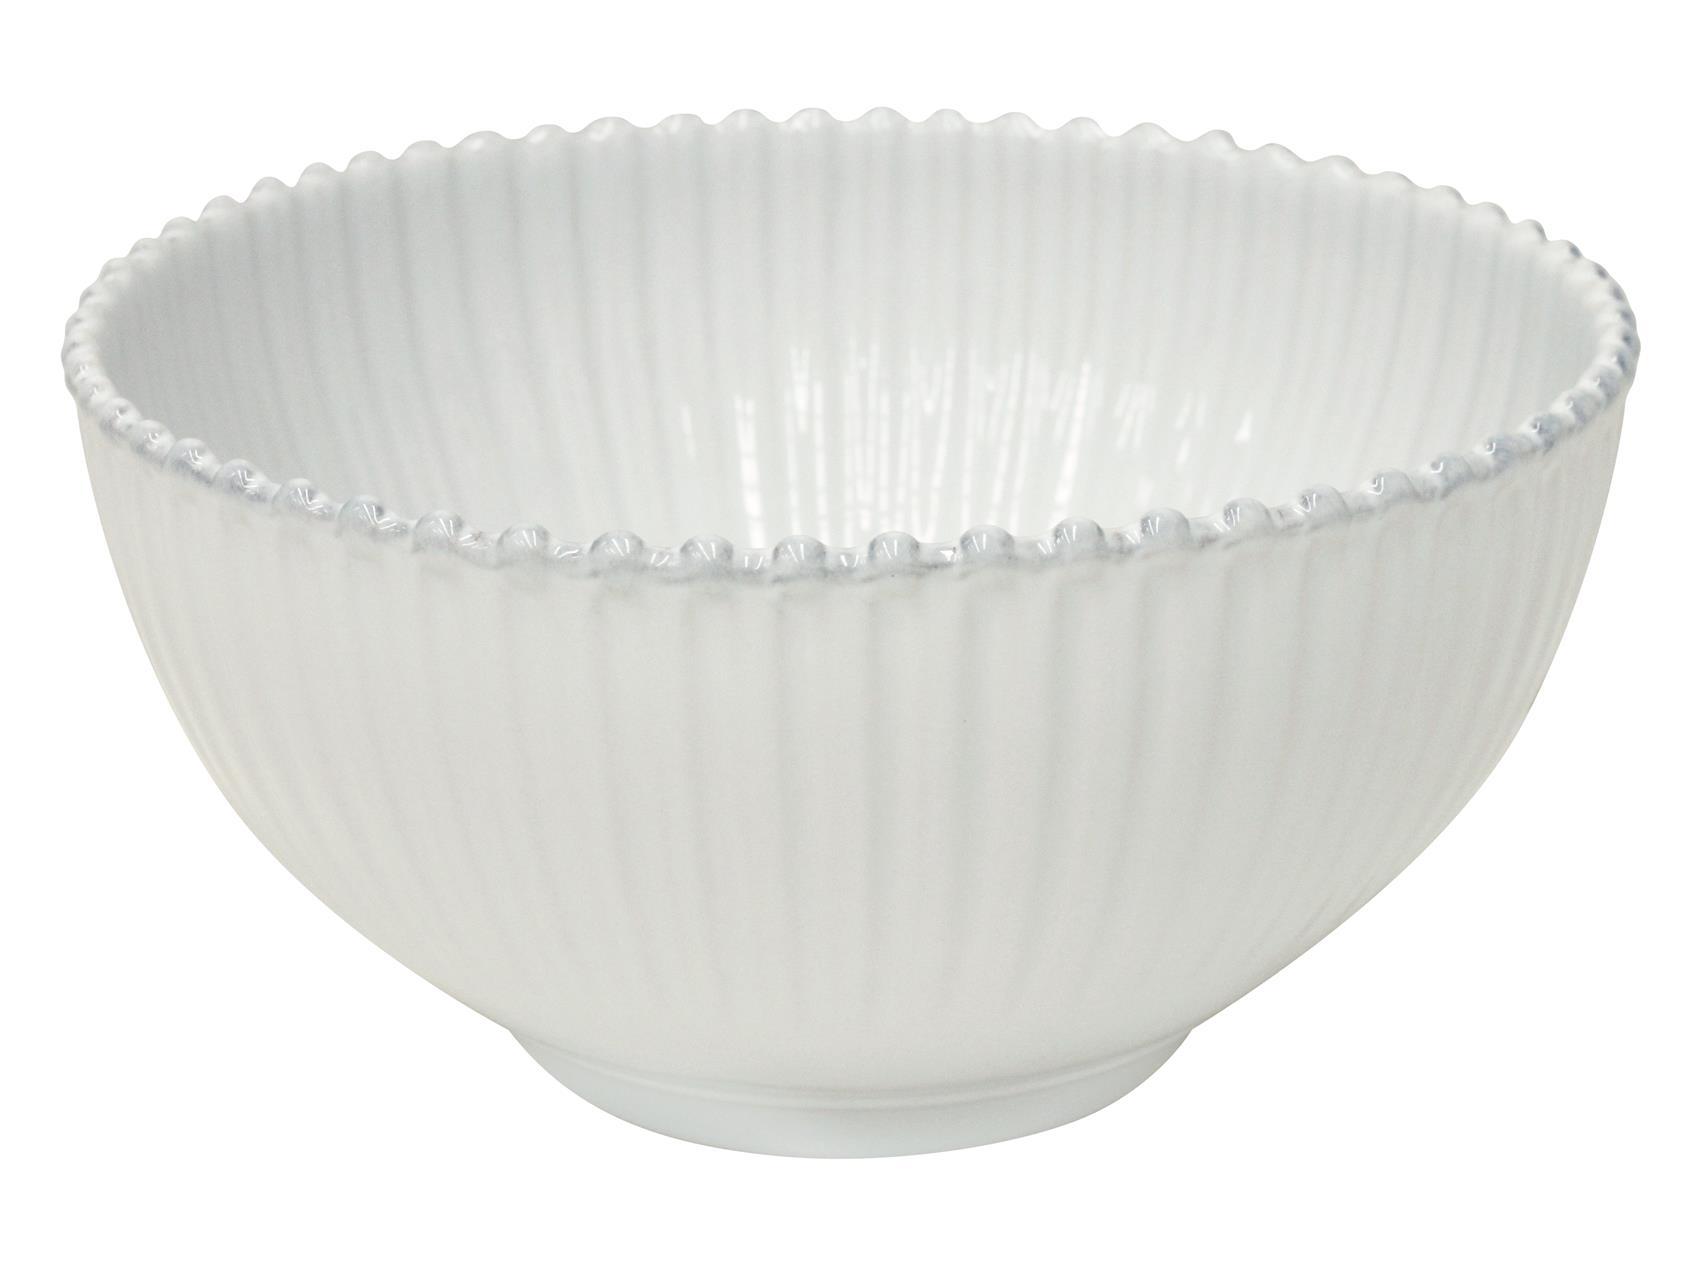 Salatschüssel Pearl weiß, 27 cm